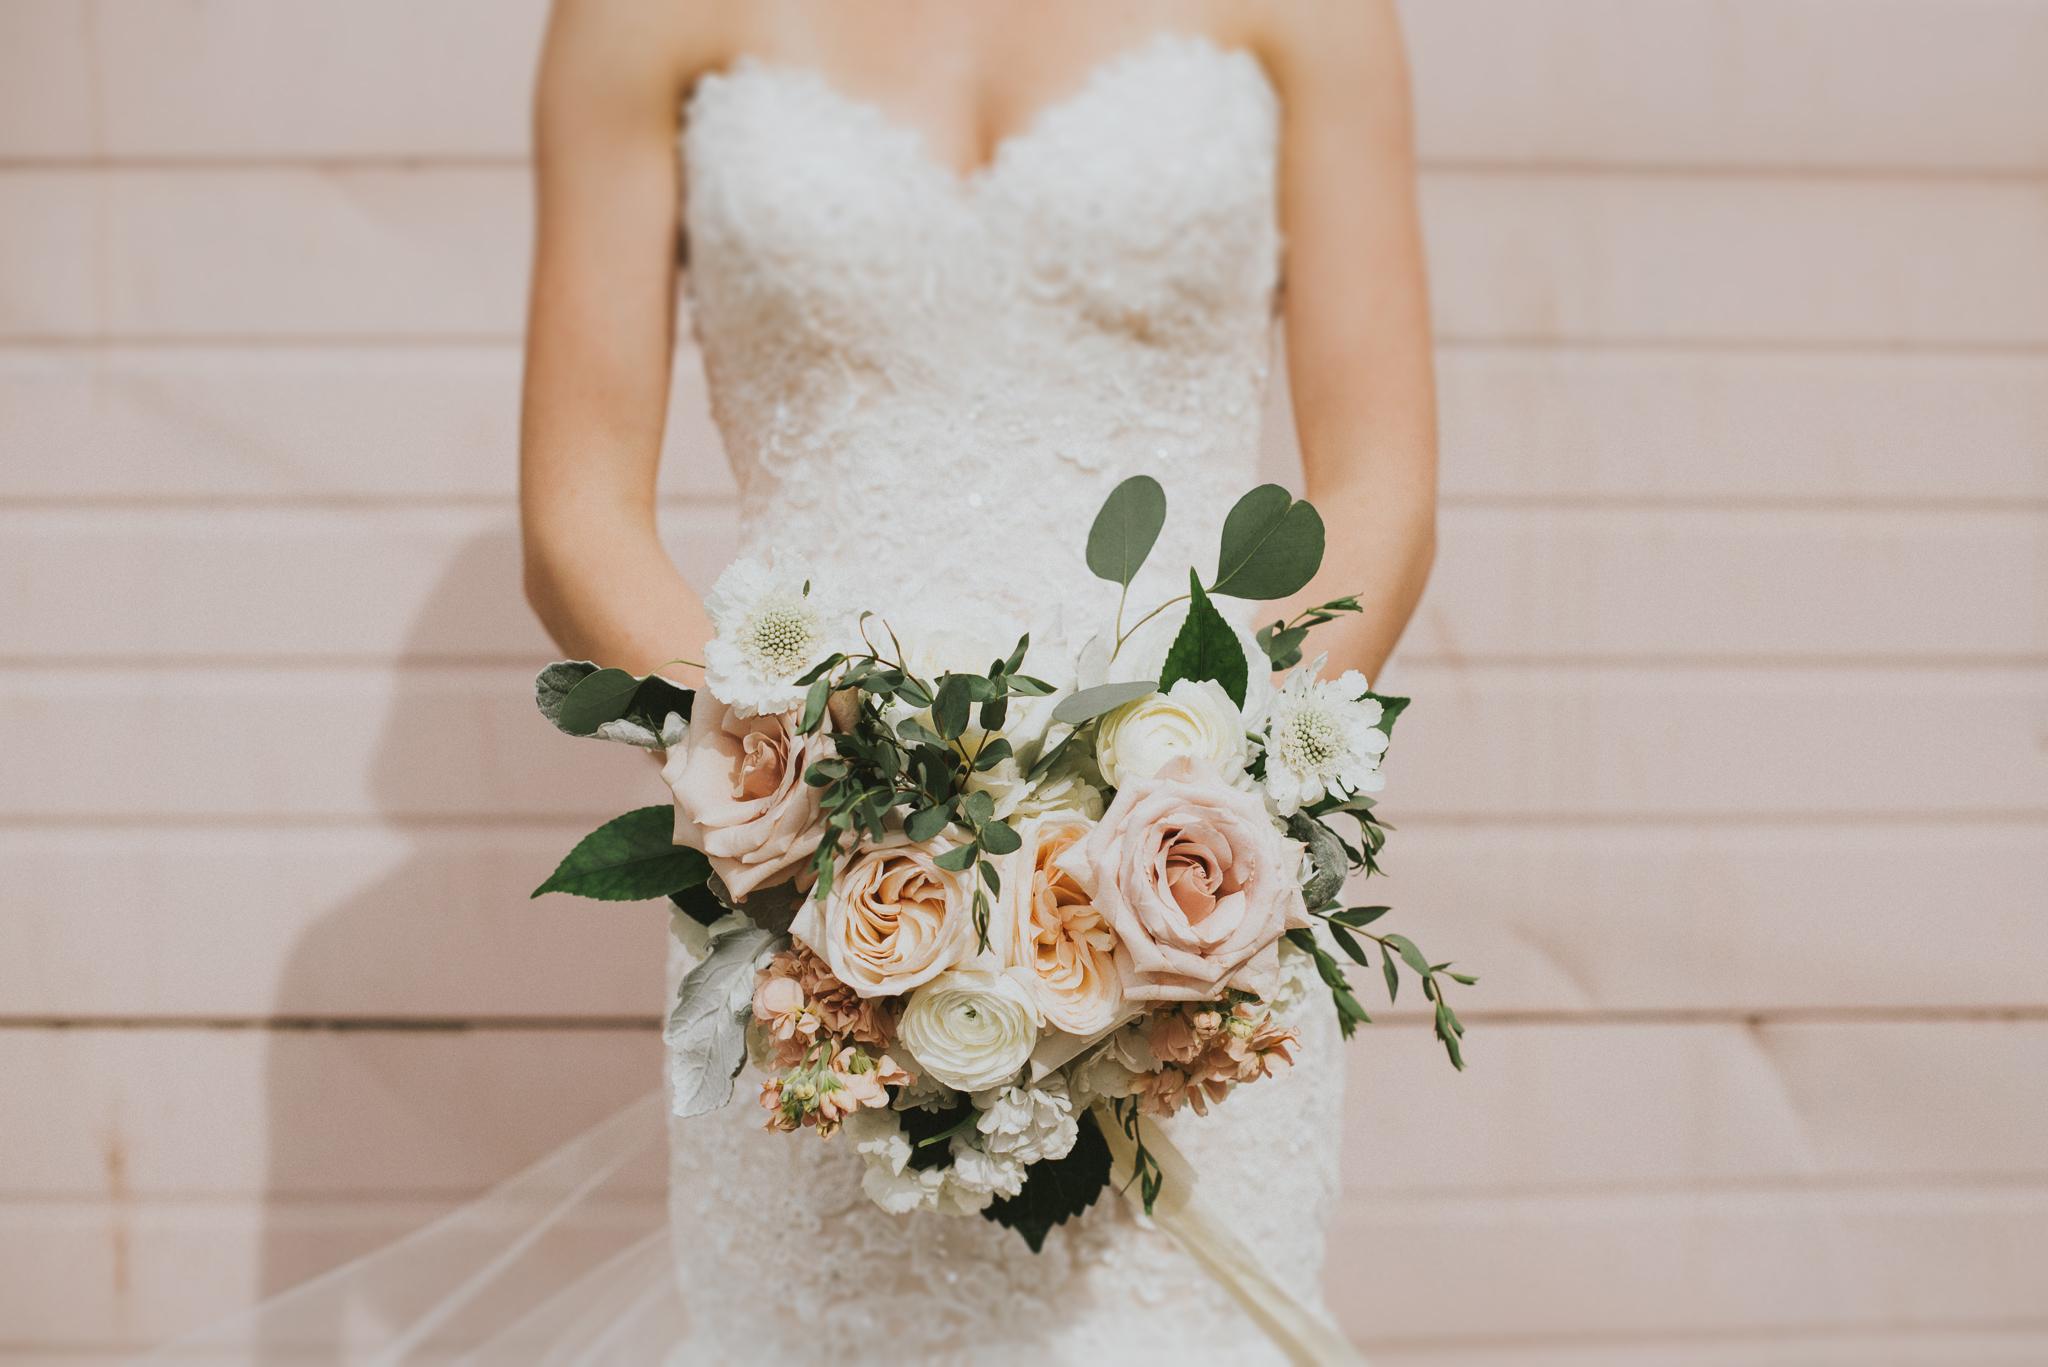 67-permanent-vancouver-wedding-courtneysteven-web-8324-ts.jpg